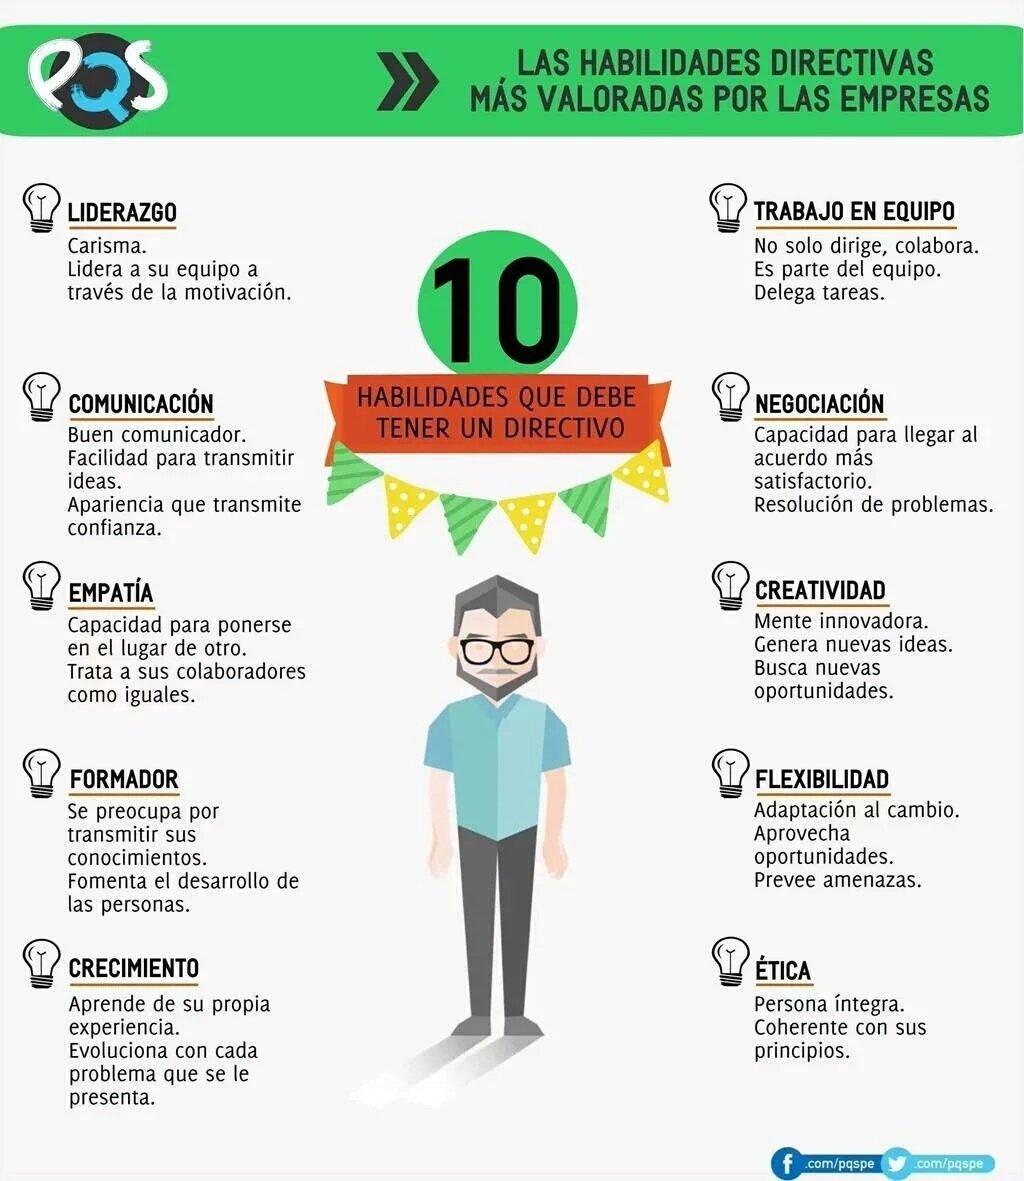 10 habilidades + valoradas en un directiv@. #rrhh #infografia #liderazgo.  @TopLogan77 https://t.co/gv2ldmClax